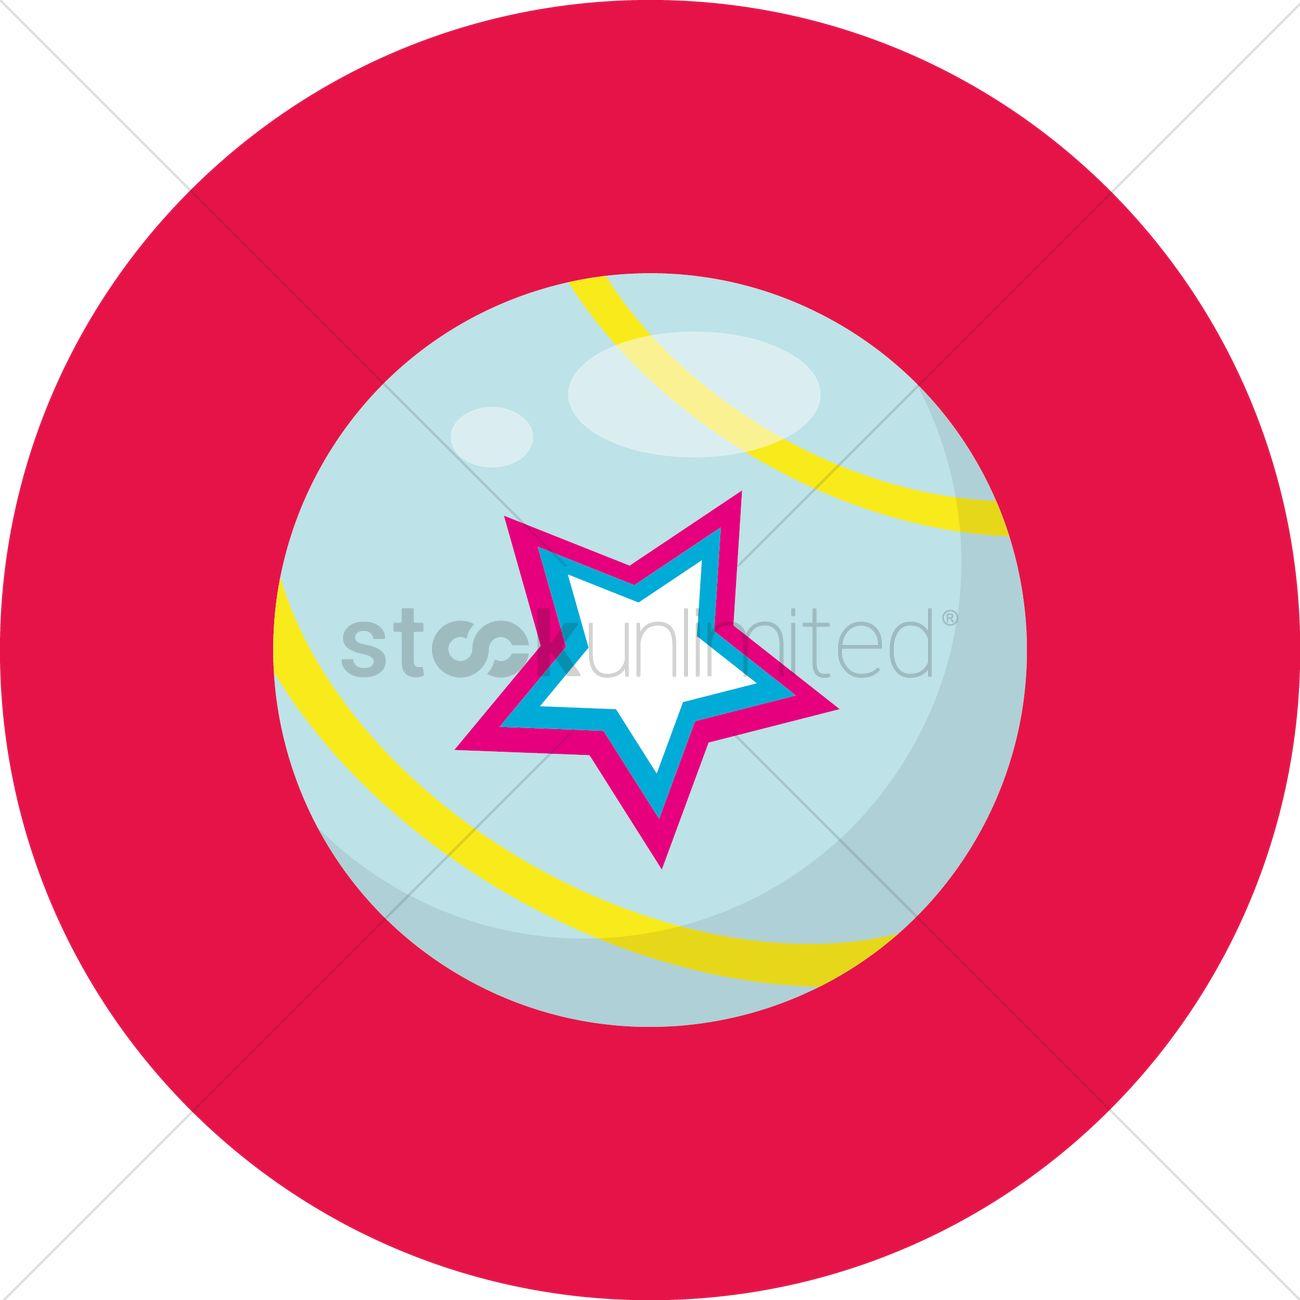 Free Star ball Vector Image.